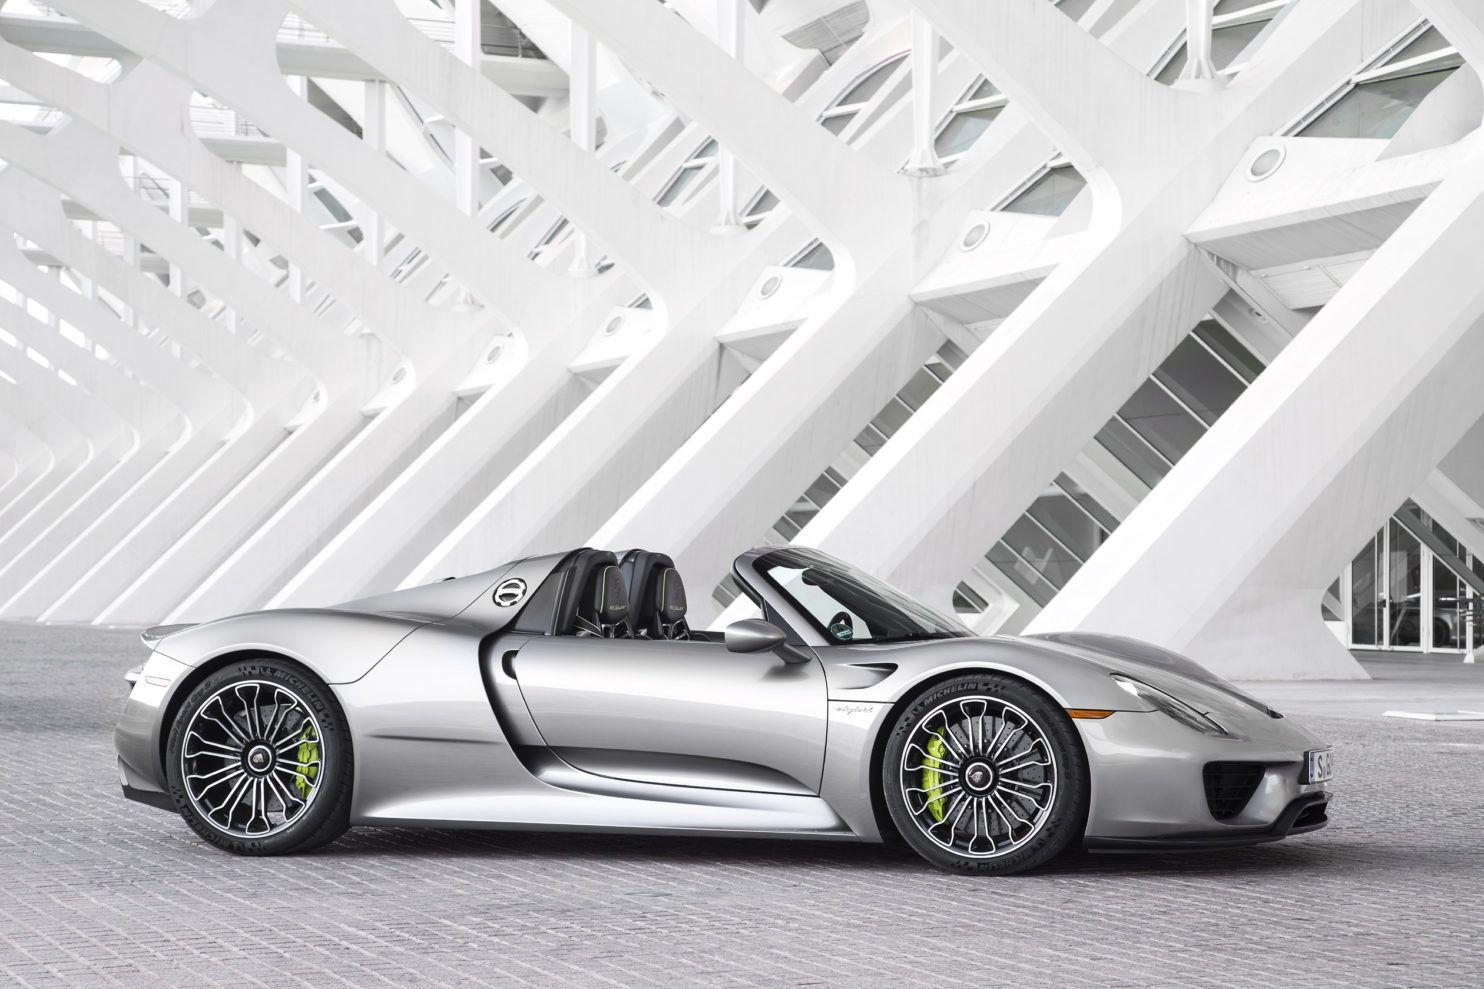 Porsche Spyder 918 (Source: Porsche)